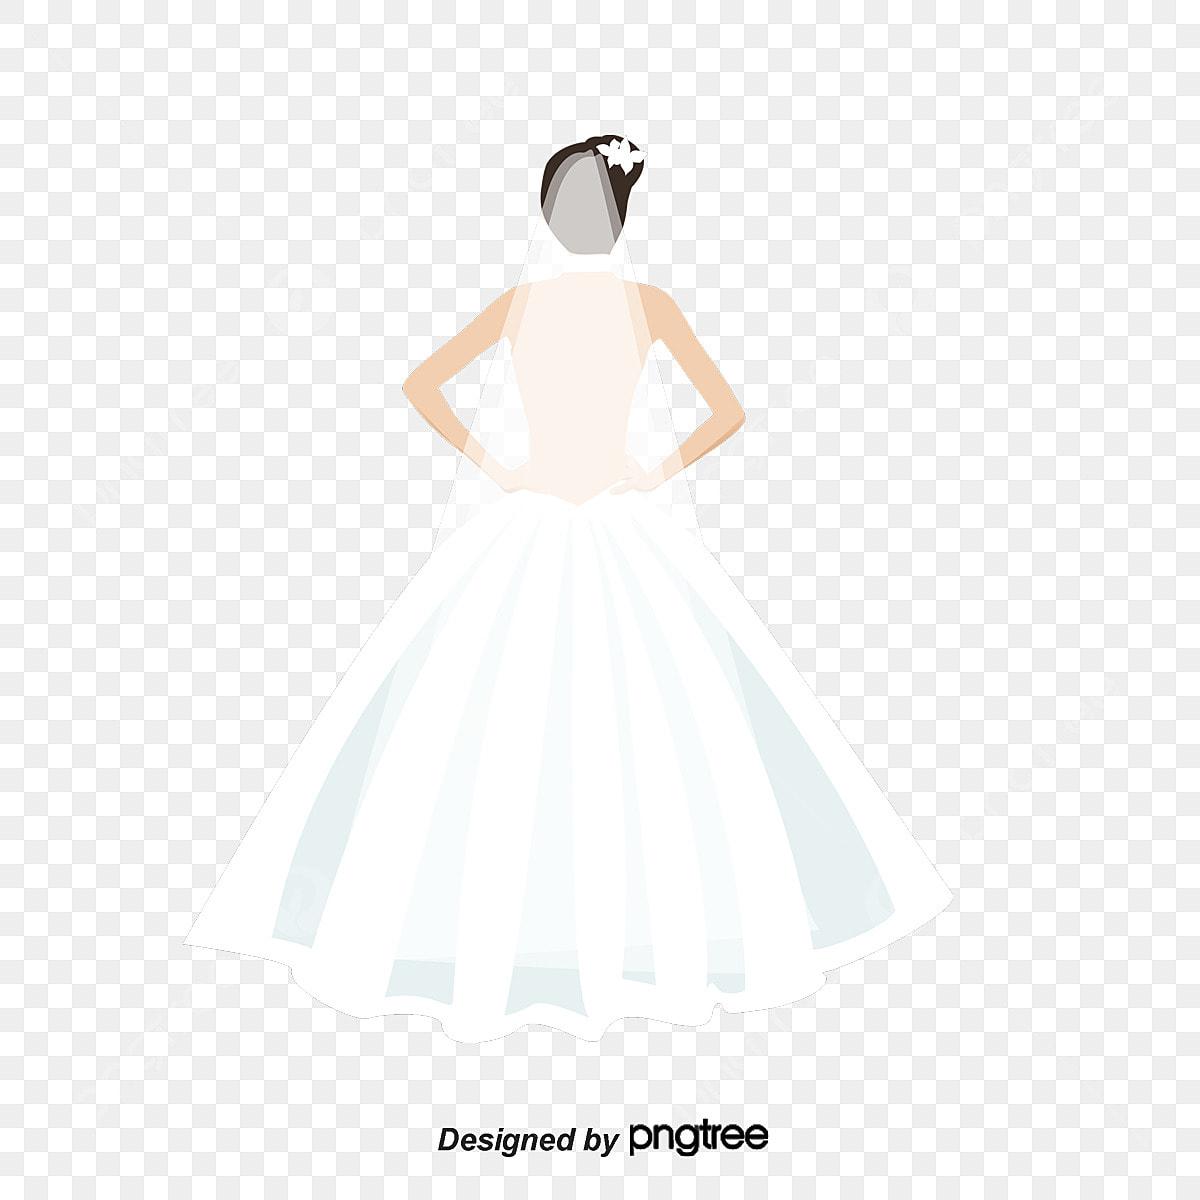 Gambar Pengantin Perempuan, Mimpi, Gaun Pengantin, Pengantin